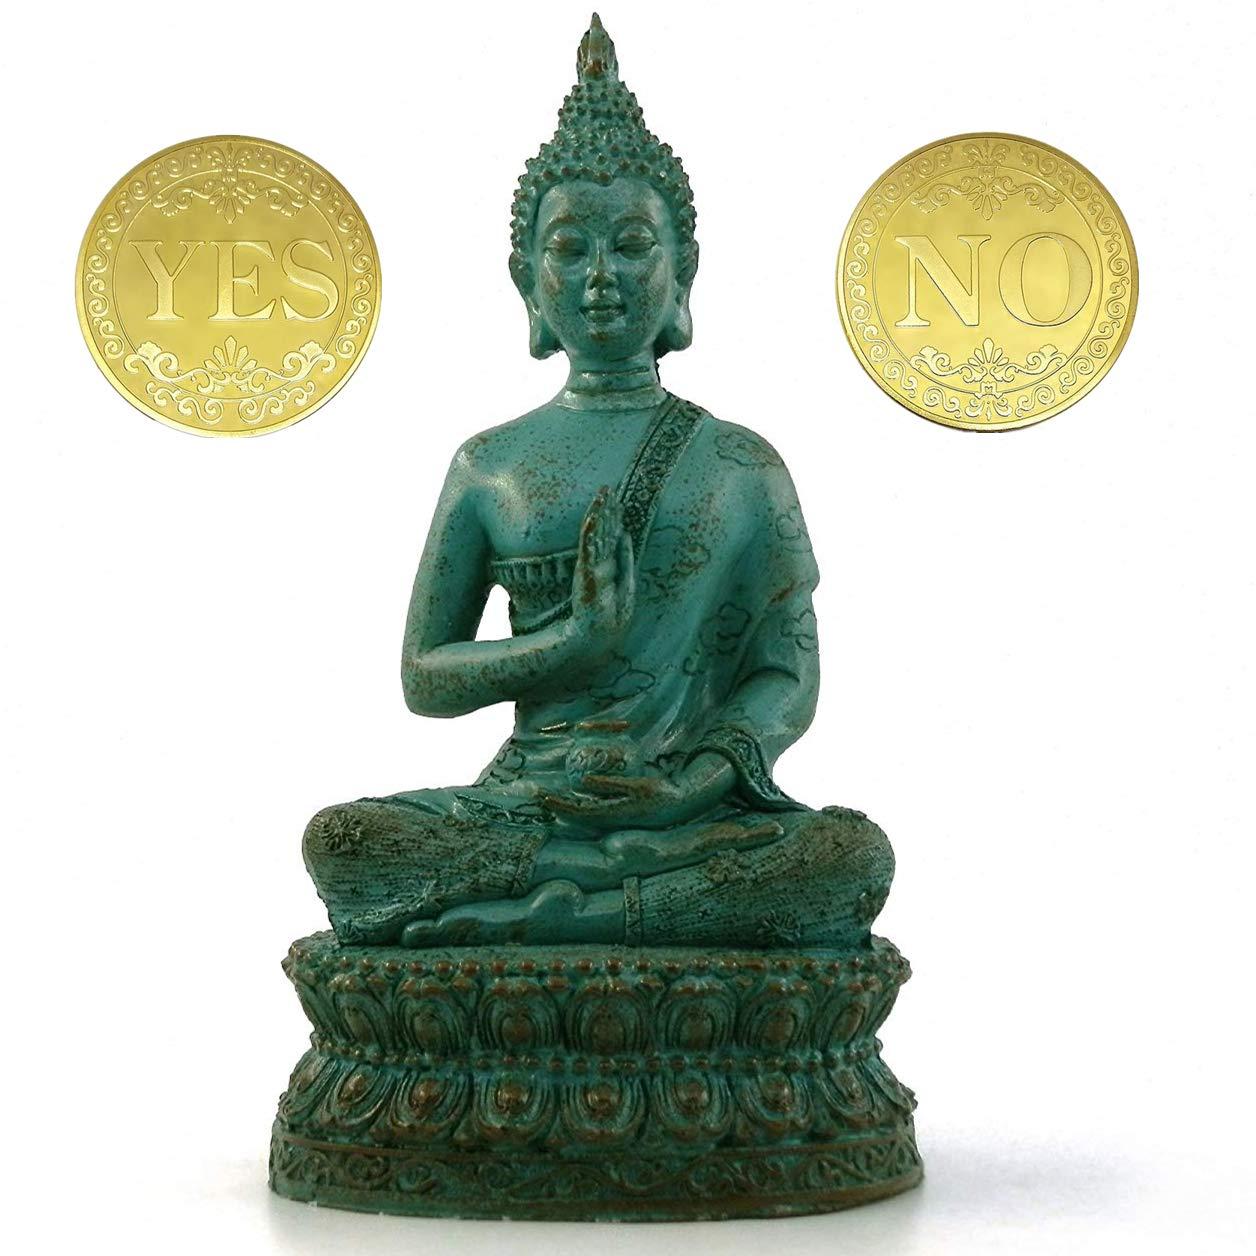 "DBassinger Antique Buddha Statue for Home Decor,7"" Thai Shakyamuni Sitting Statue Resin with Bronze Finish, Decoration for Meditation Altar (Verdigris)"